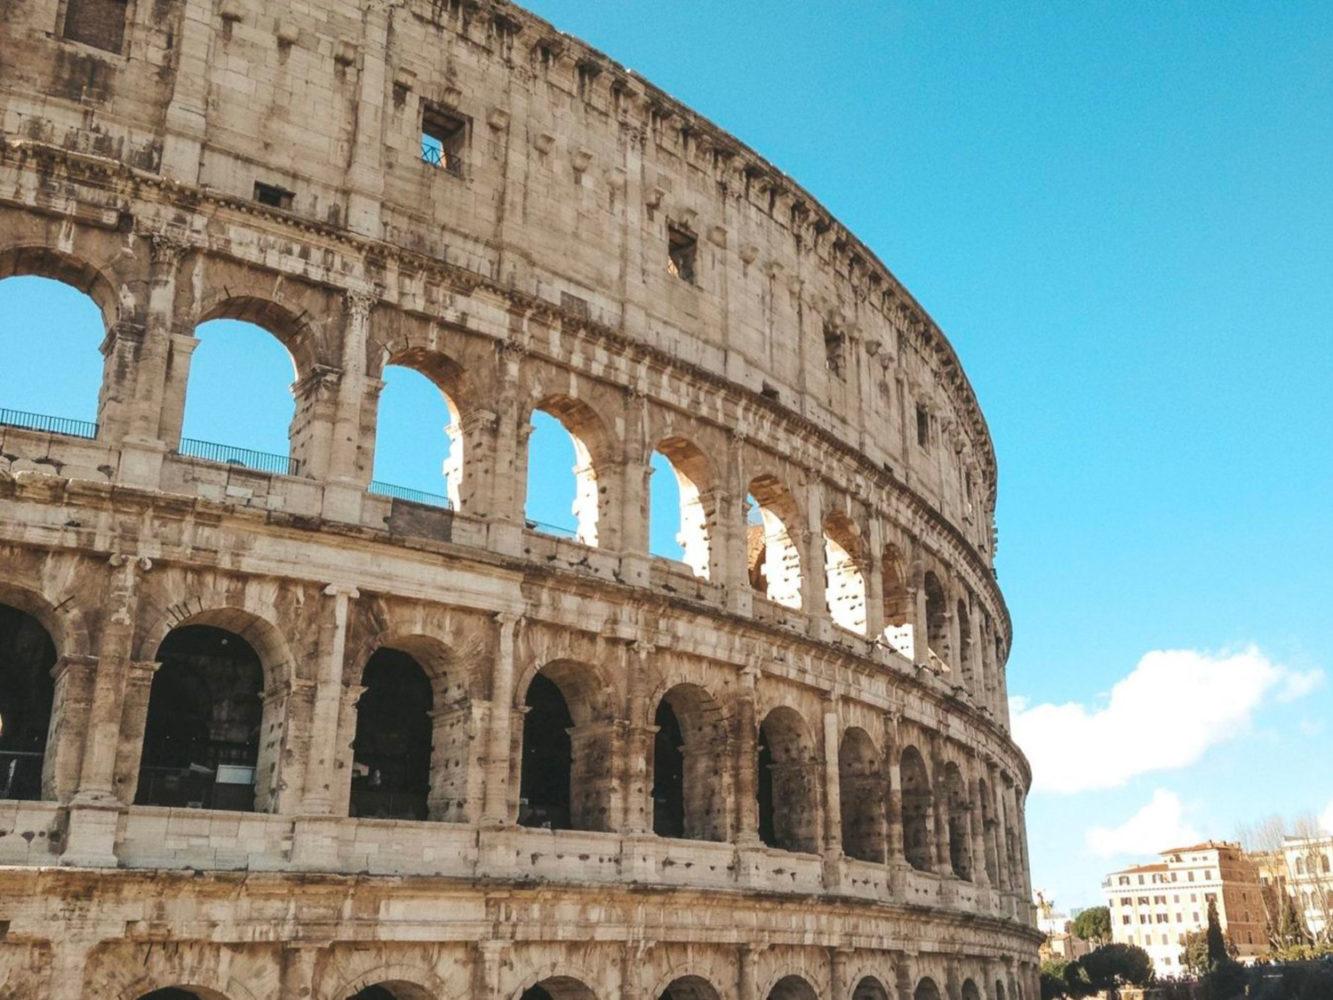 Aperçu du Colisée de Rome